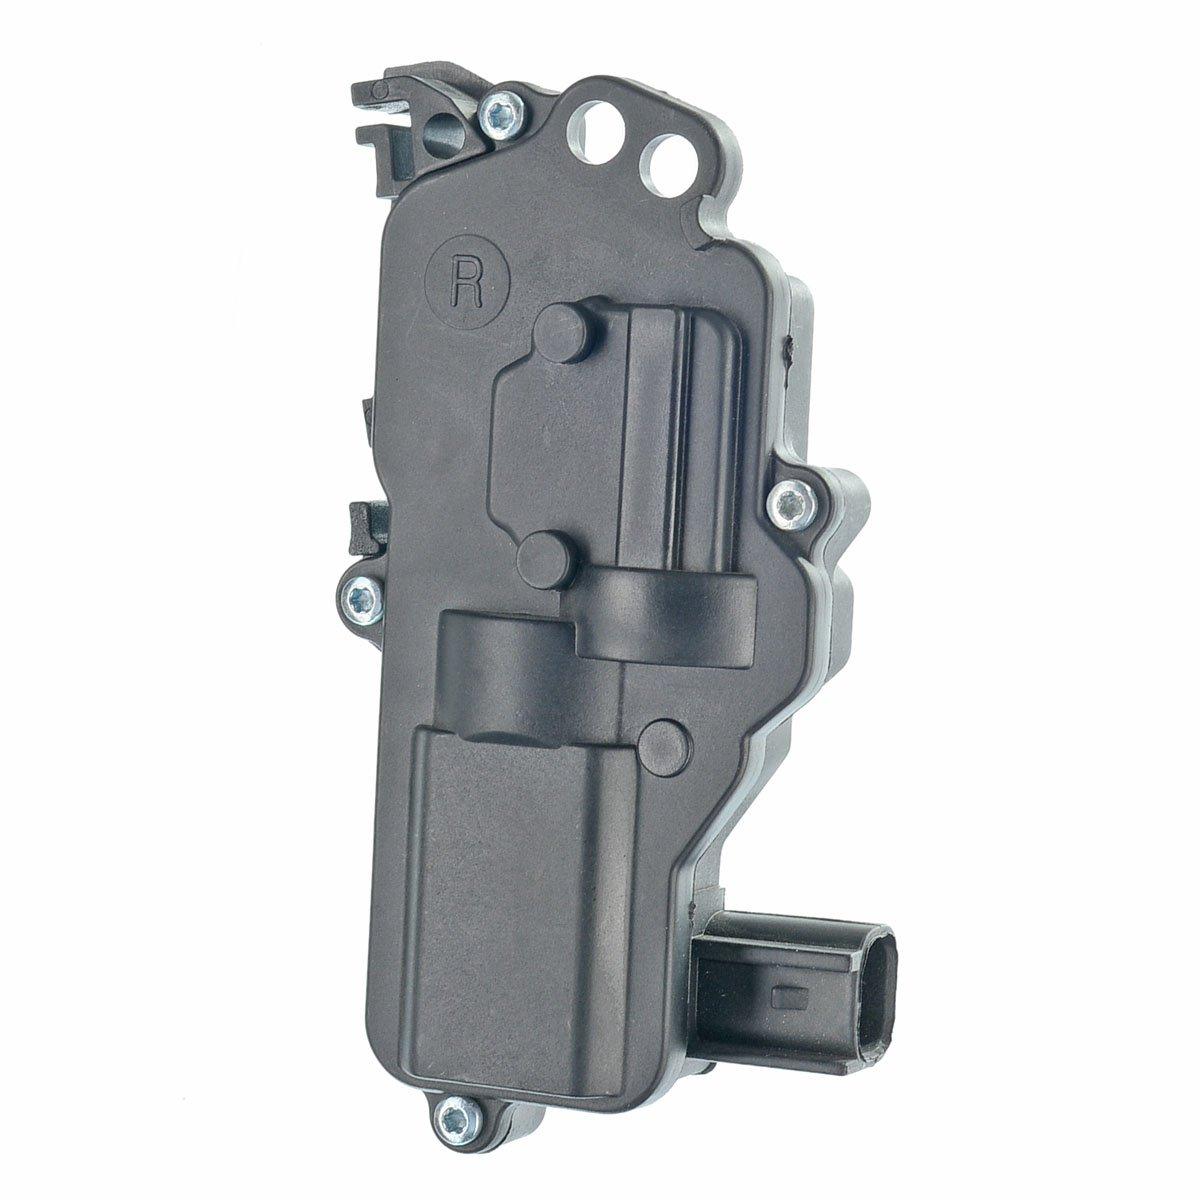 A-Premium Door Lock Actuators Motors for Ford Explorer F-150 Five Hundred Freestyle Lobo Mustang Taurus Lincoln Aviator Mark LT Mercury Left and Right 2-PC Set